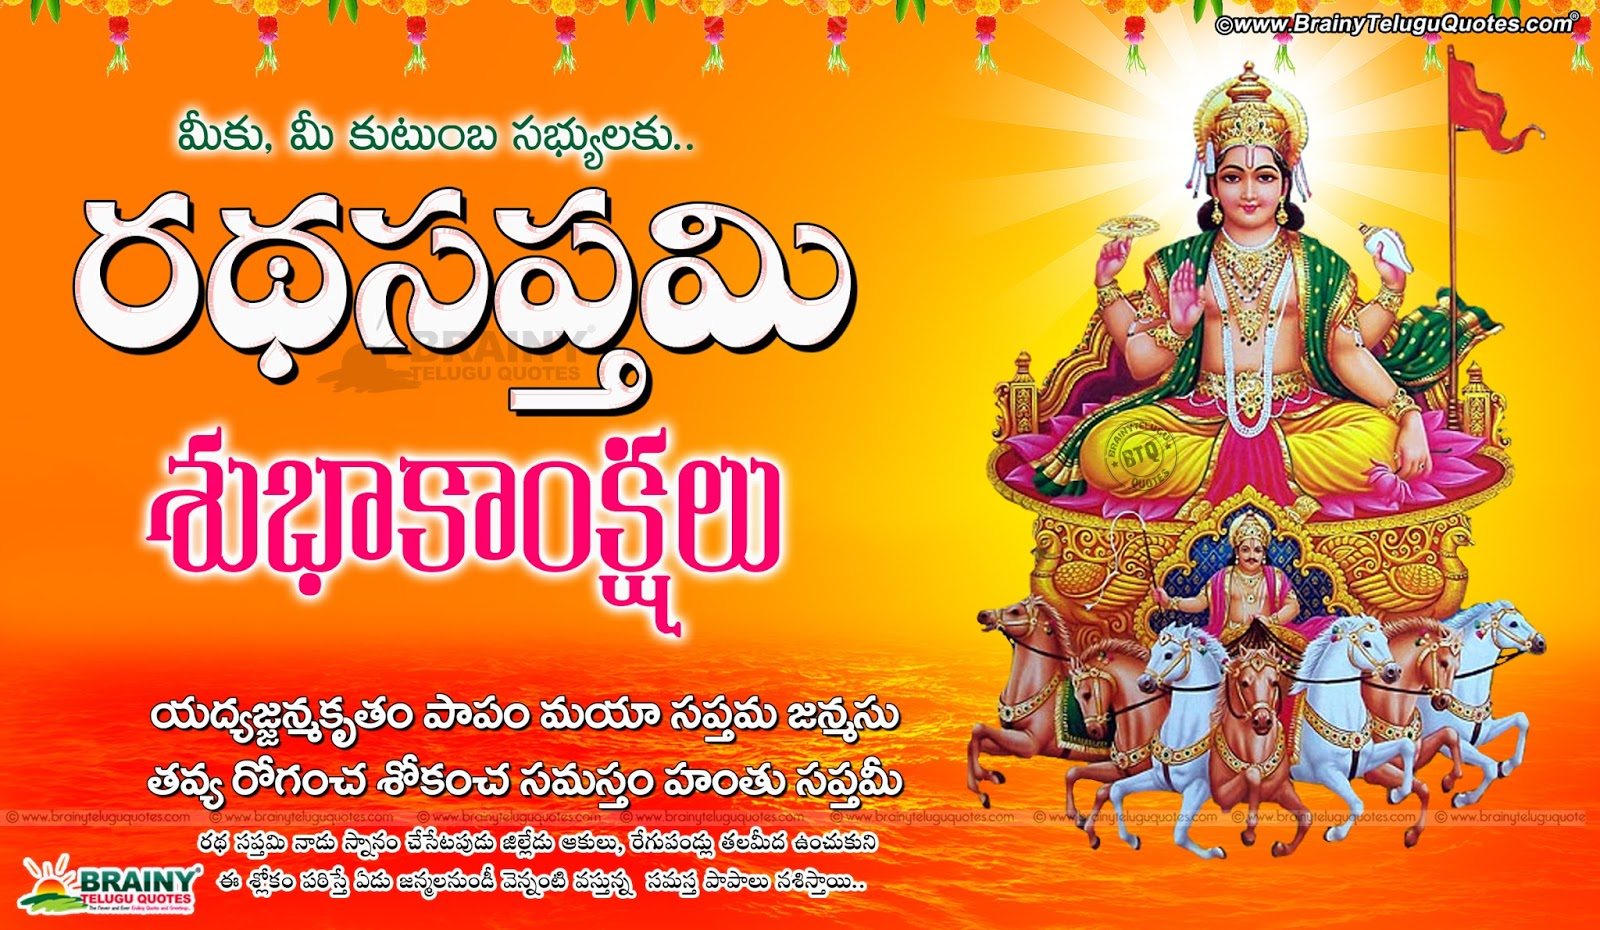 Advacne Ratha Saptami Wishes Quotes Hd Wallpapers In Telugu